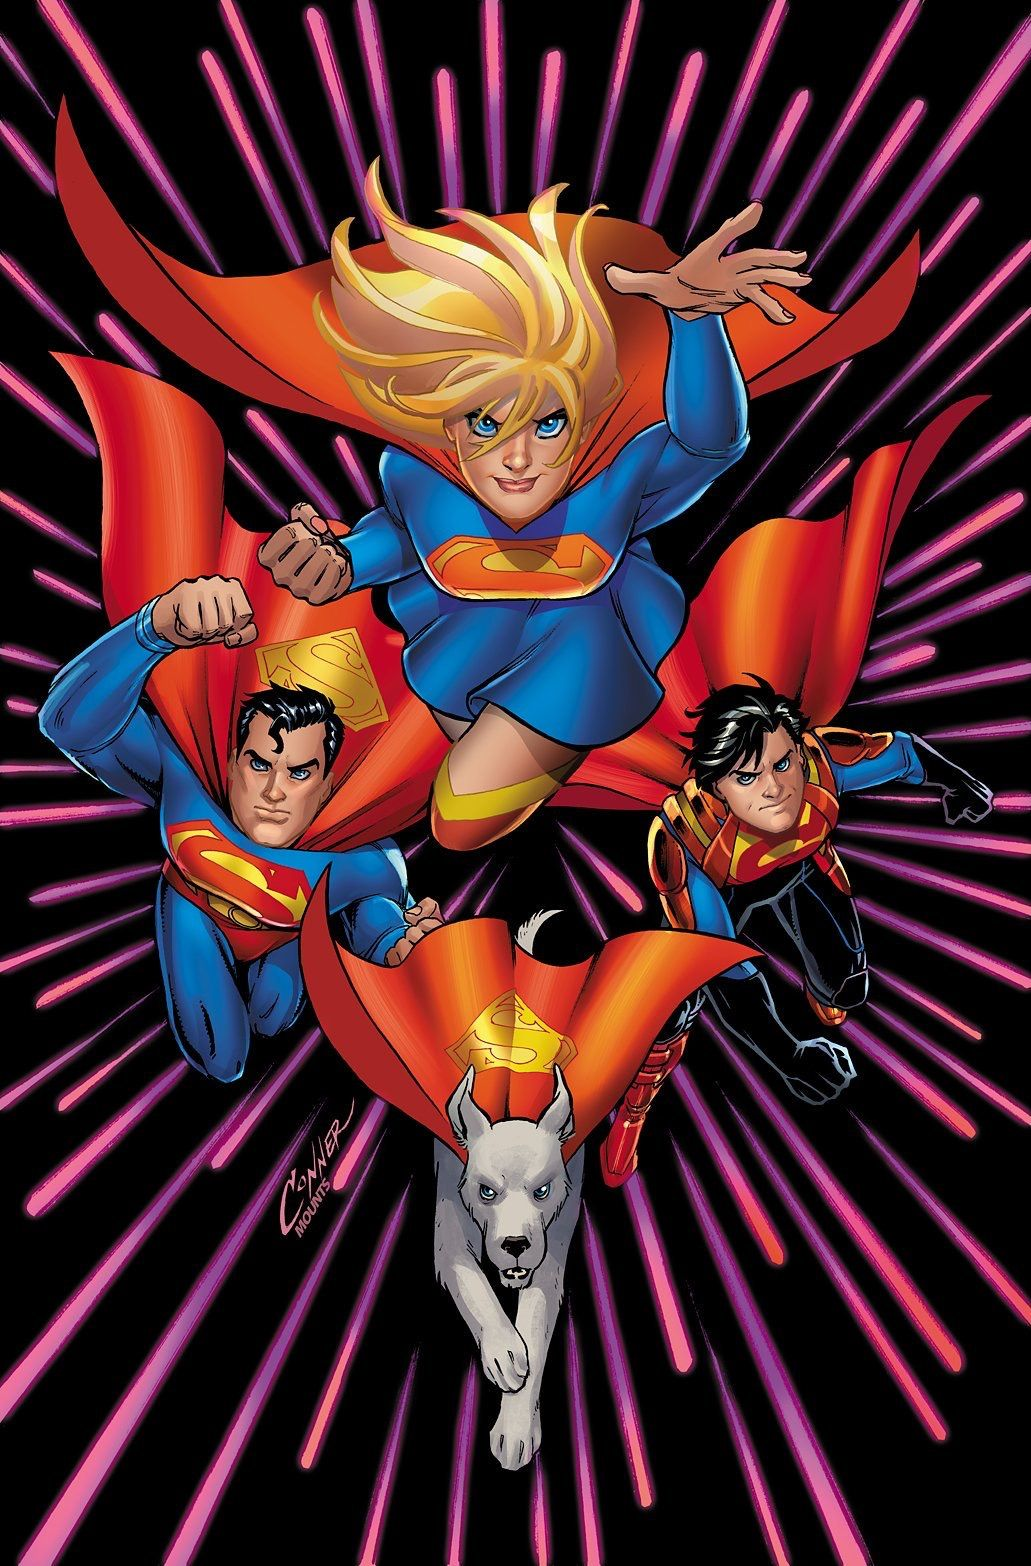 Supergirl Vol 7 31 Textless Variant.jpg